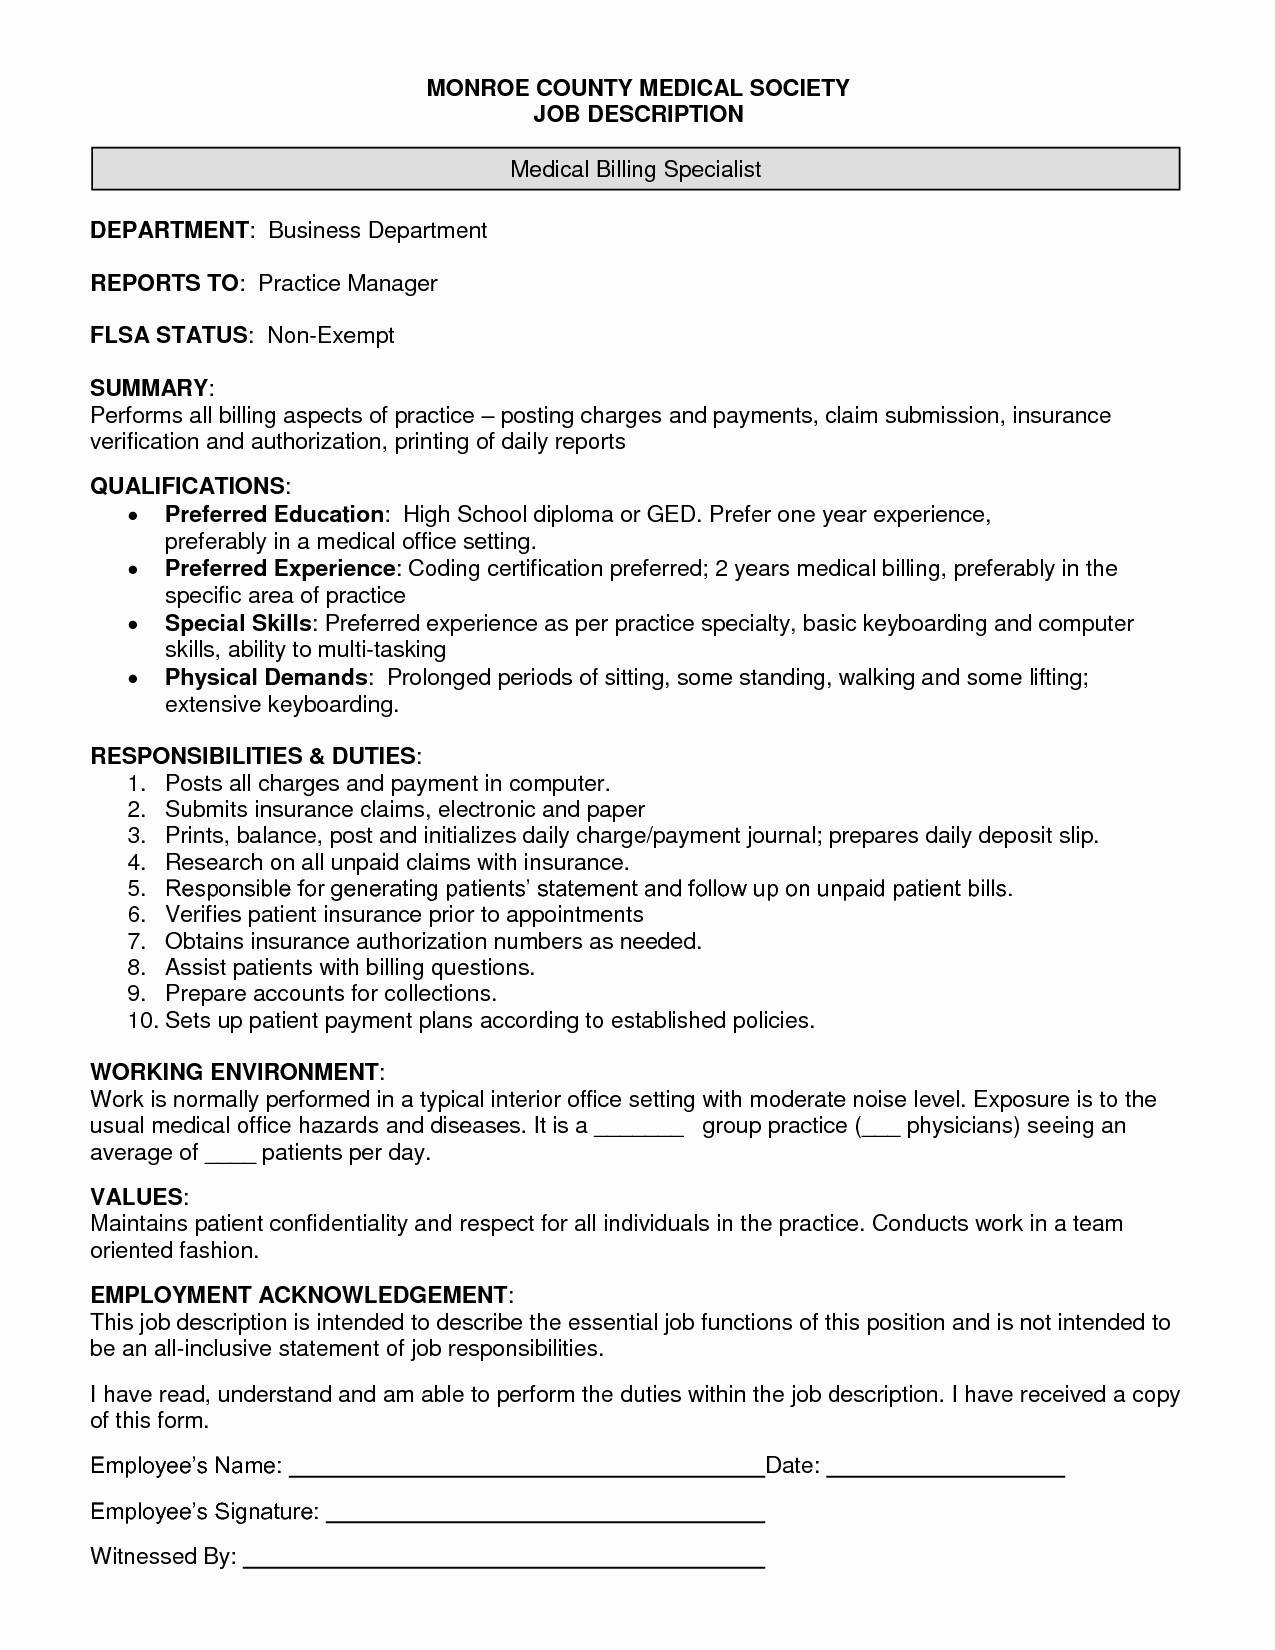 Medical Job Resume Templates